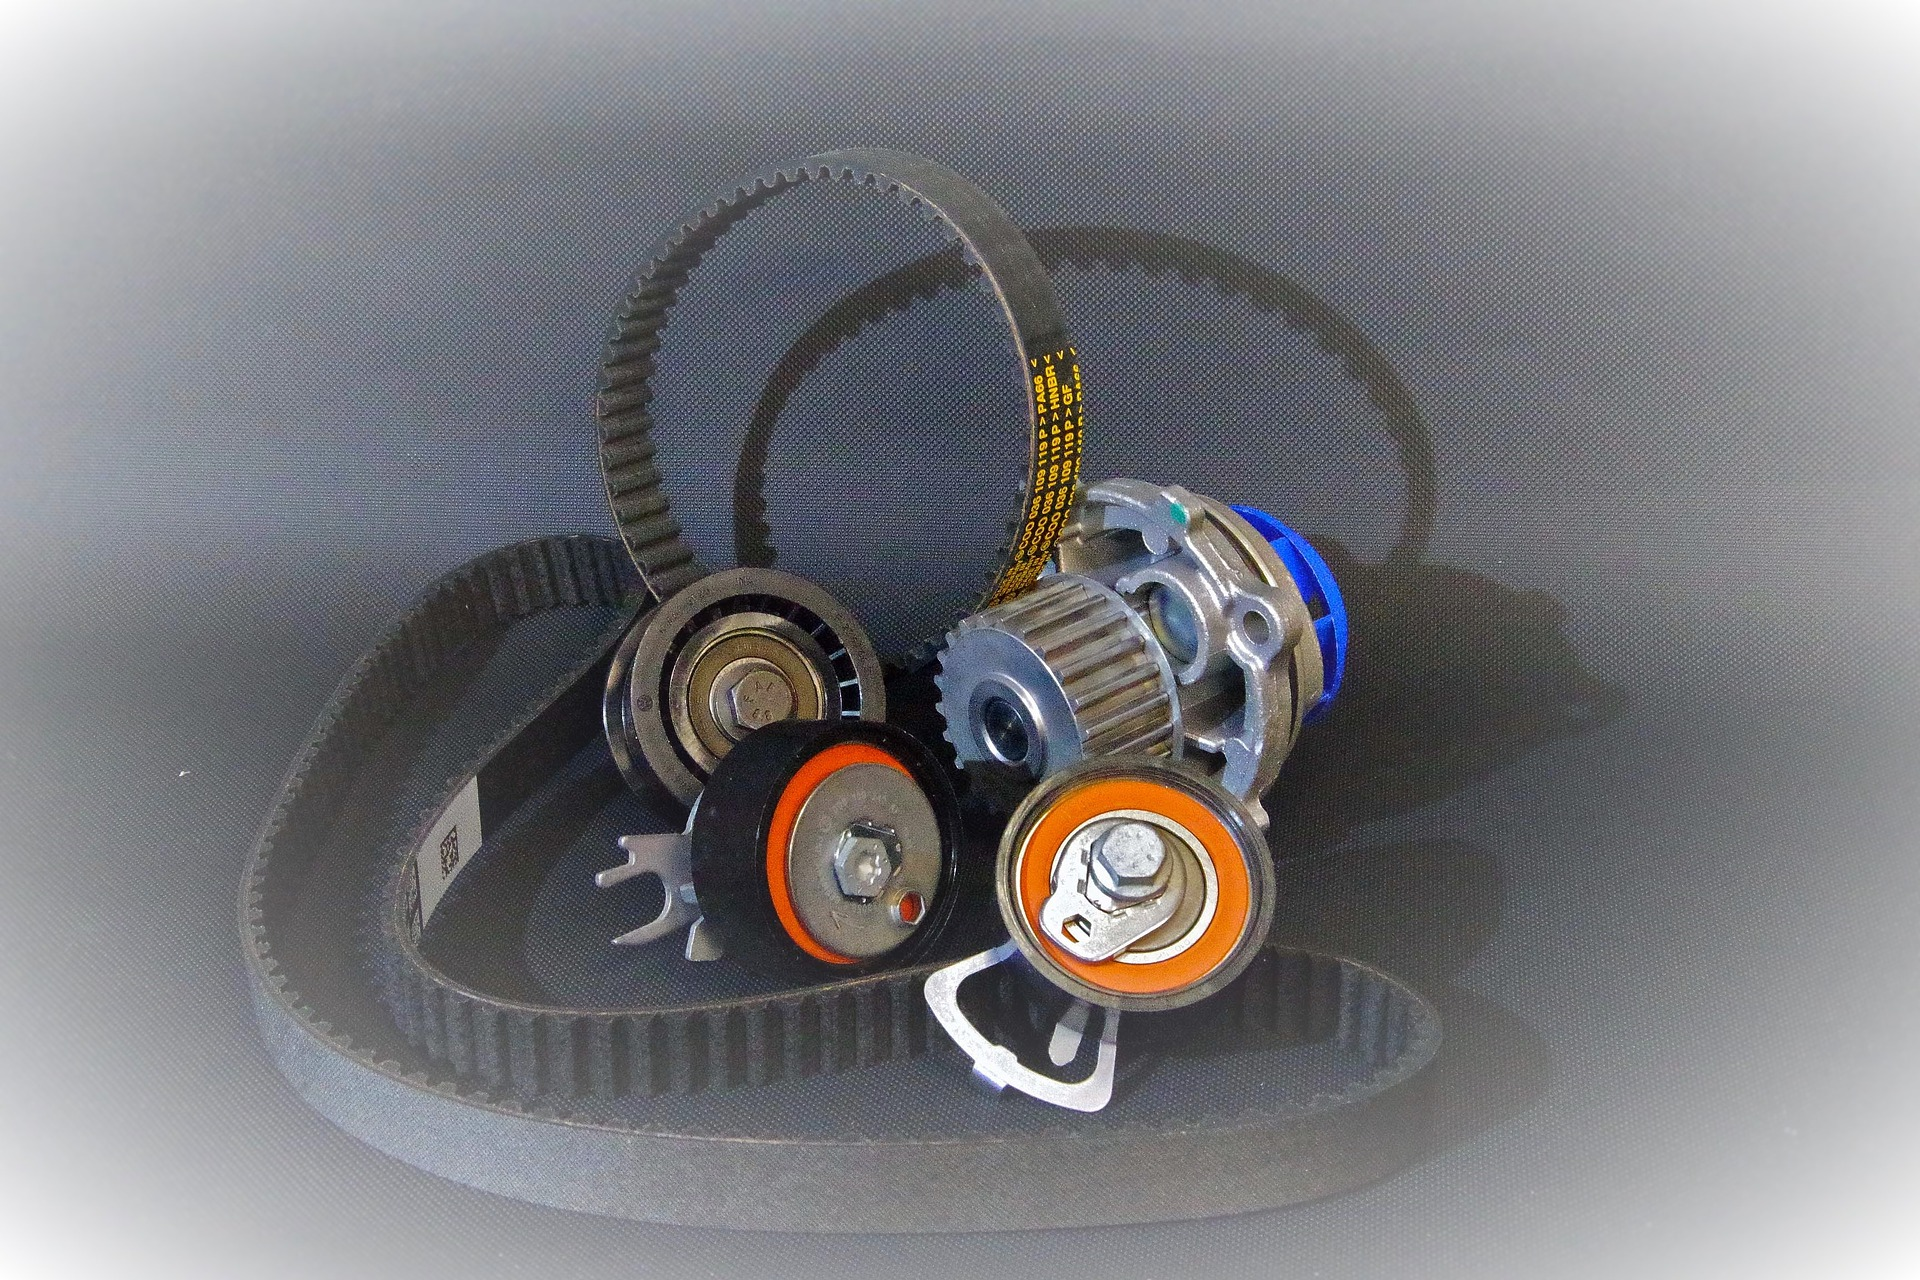 G-K4/15 - Reparaturtechnik 4 -Kfz-Instandsetzung